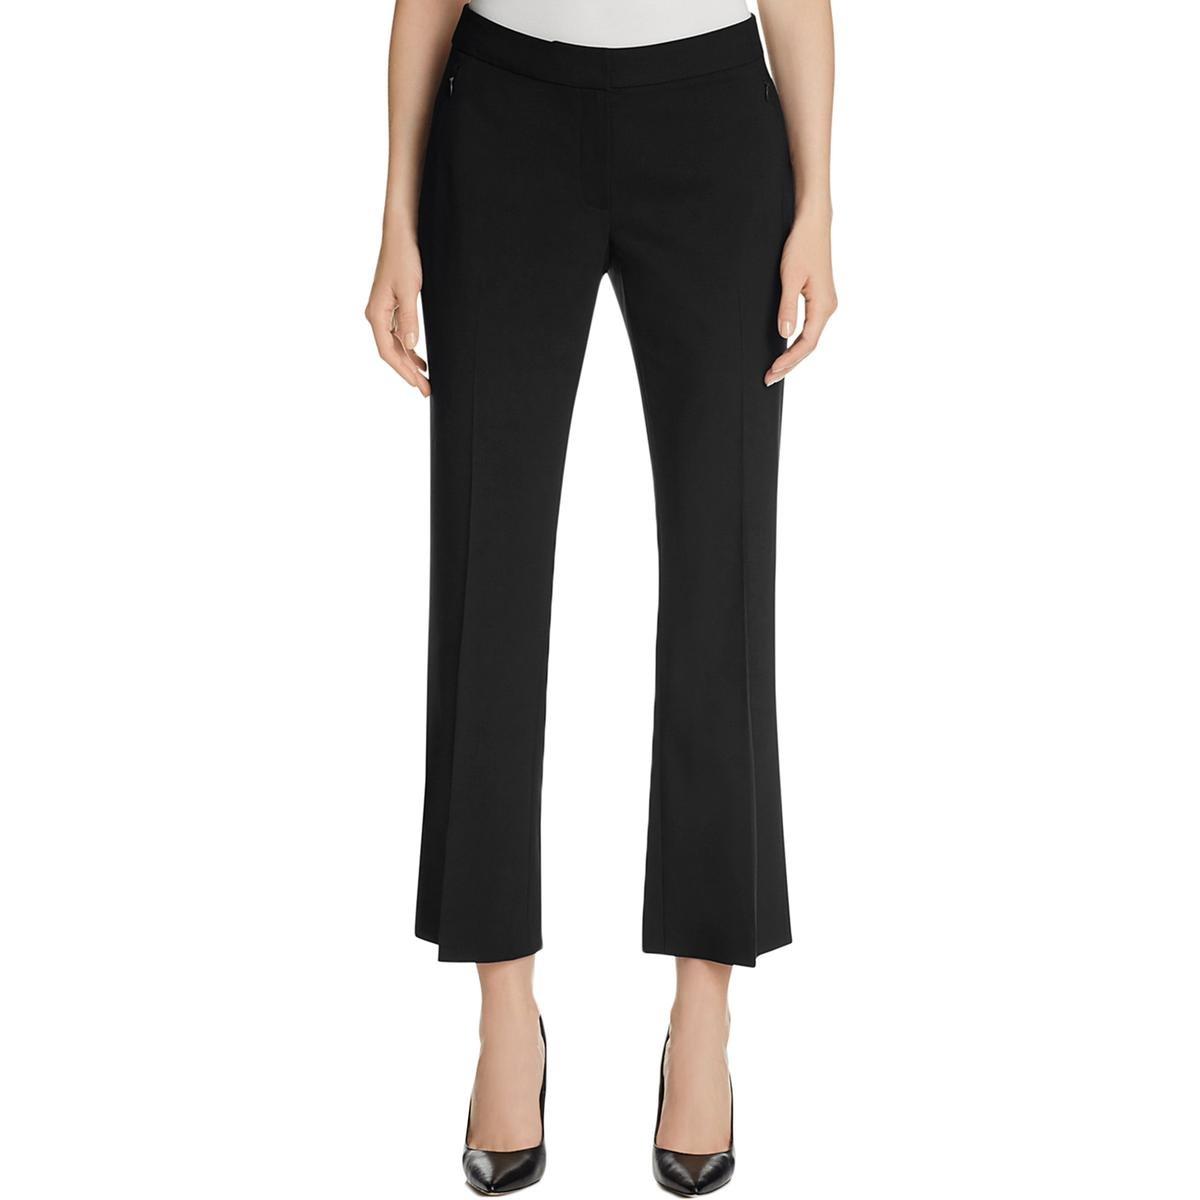 Elie Tahari Womens Harper Wool Classic Fit Dress Pants Black 10